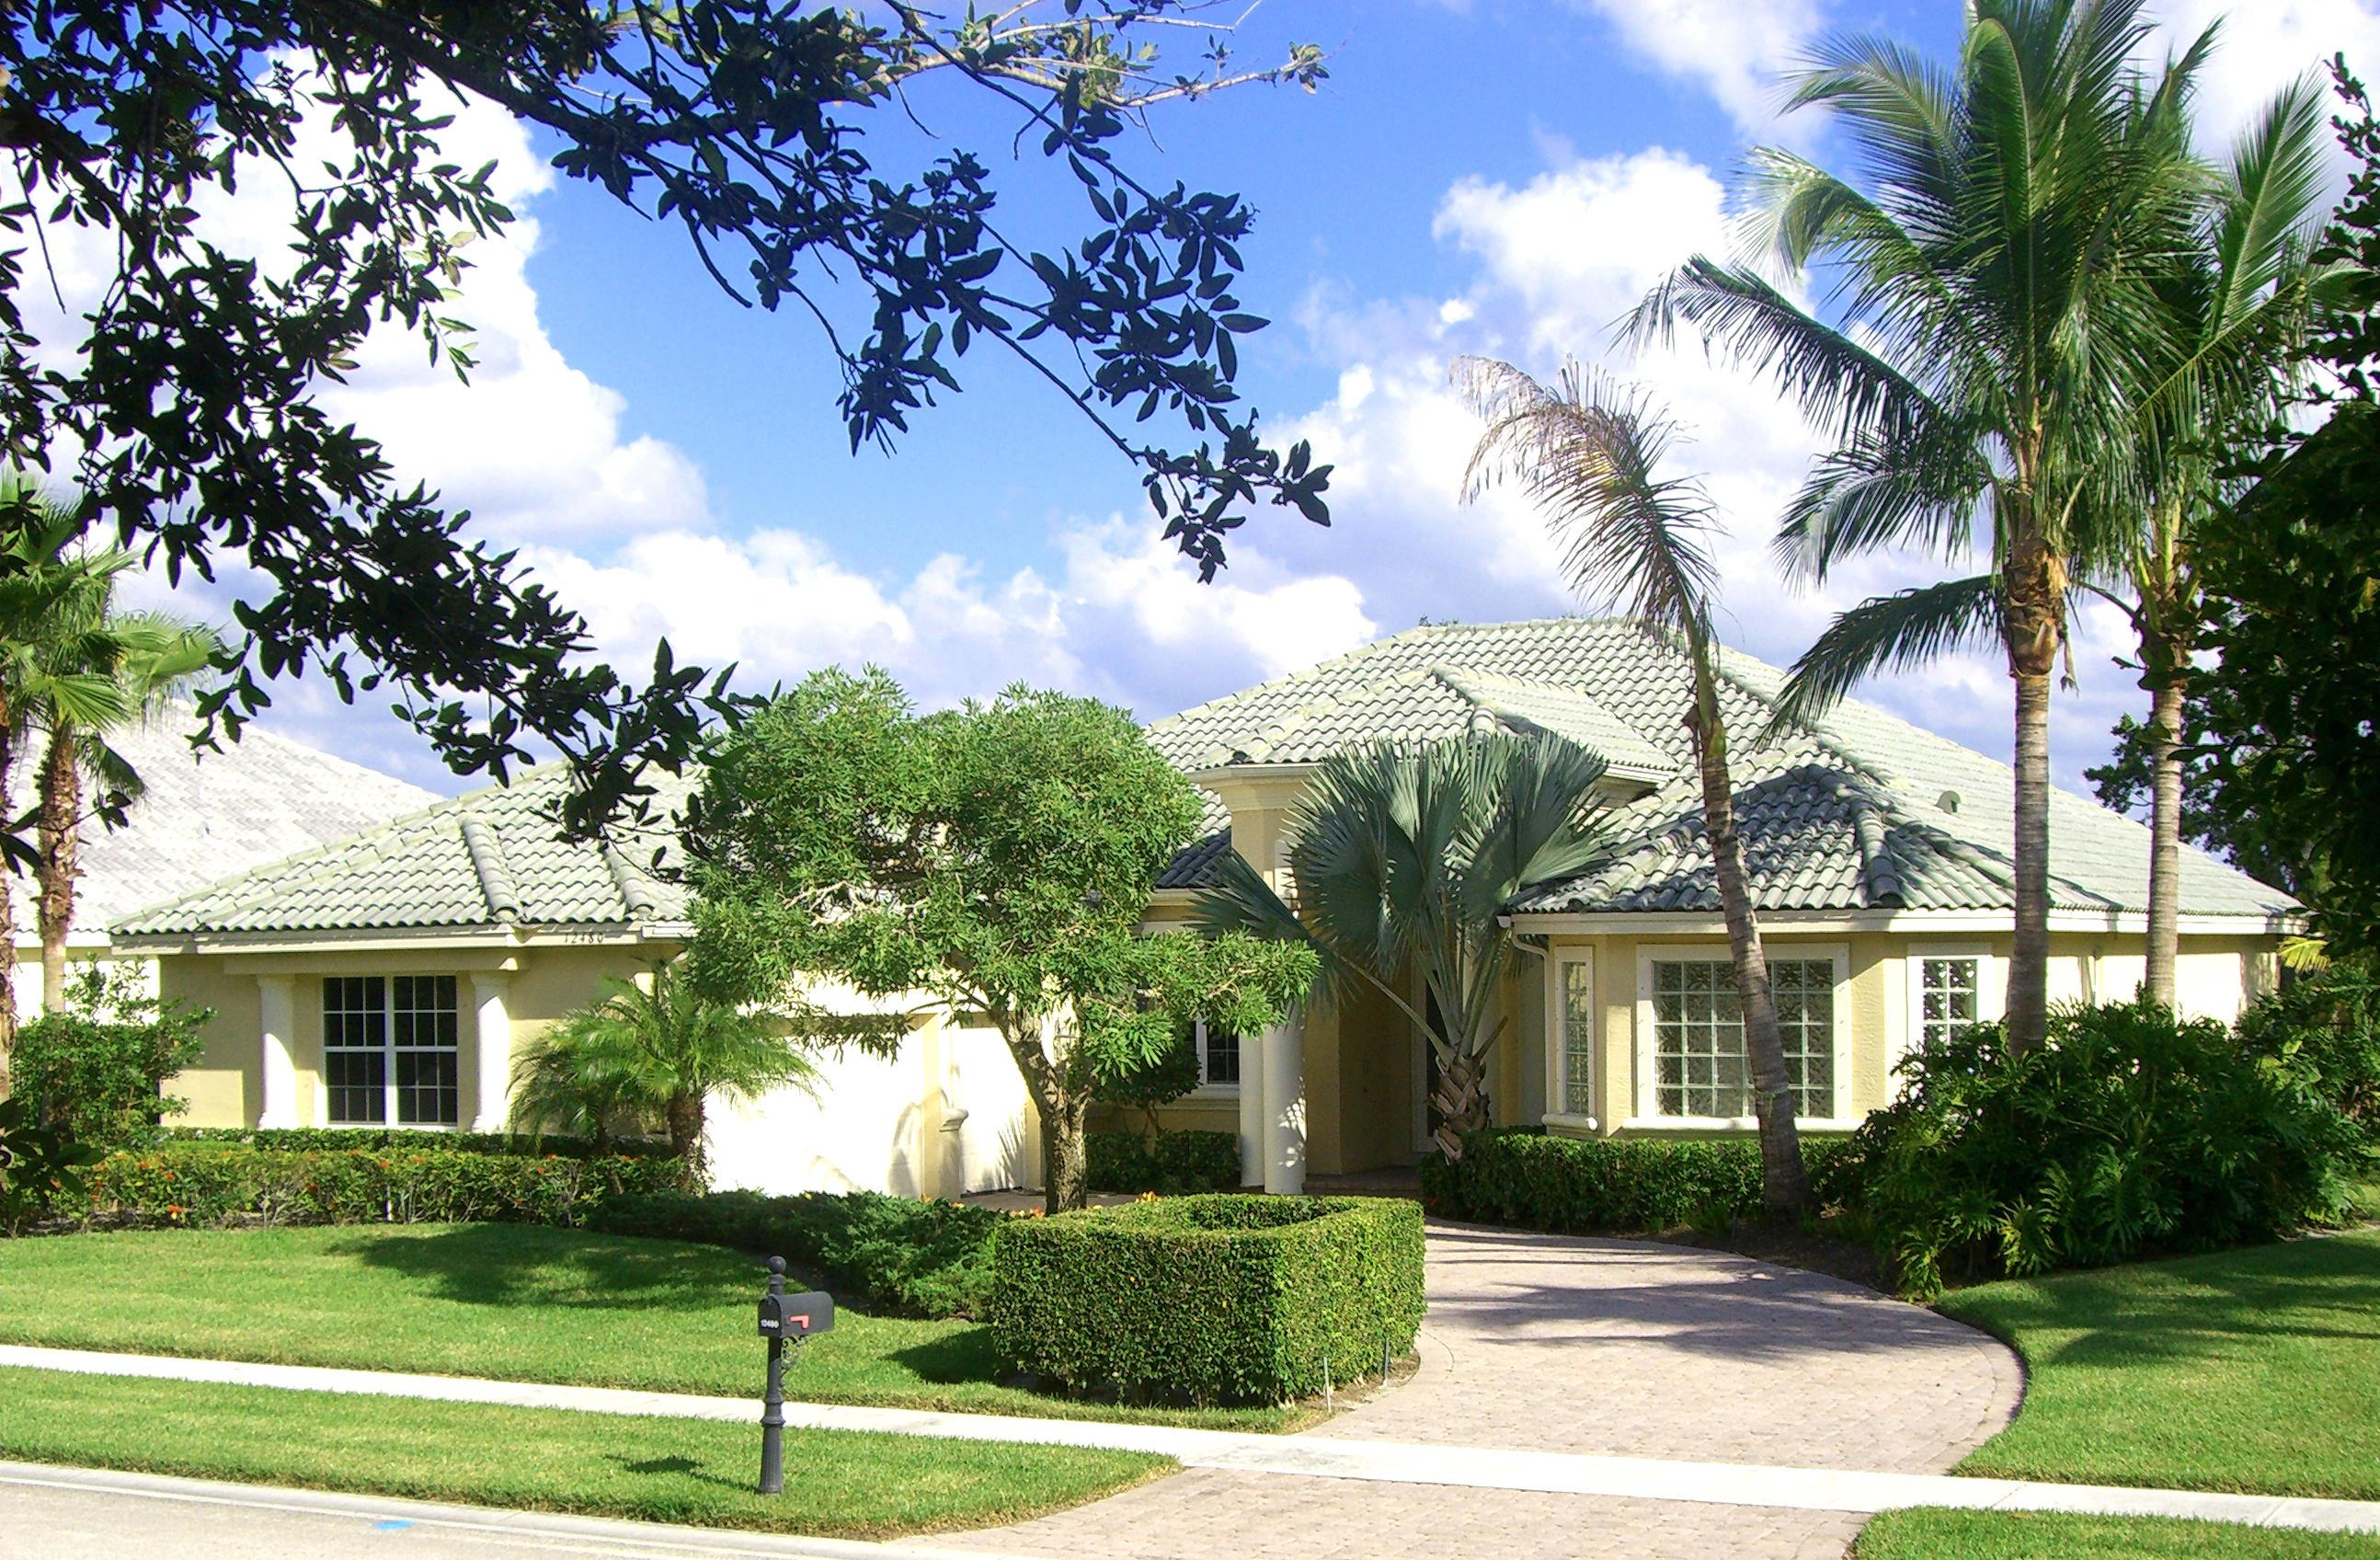 12480 Sunnydale Drive, Wellington, Florida 33414, 4 Bedrooms Bedrooms, ,4 BathroomsBathrooms,Single Family,For Sale,Sunnydale,RX-10521660